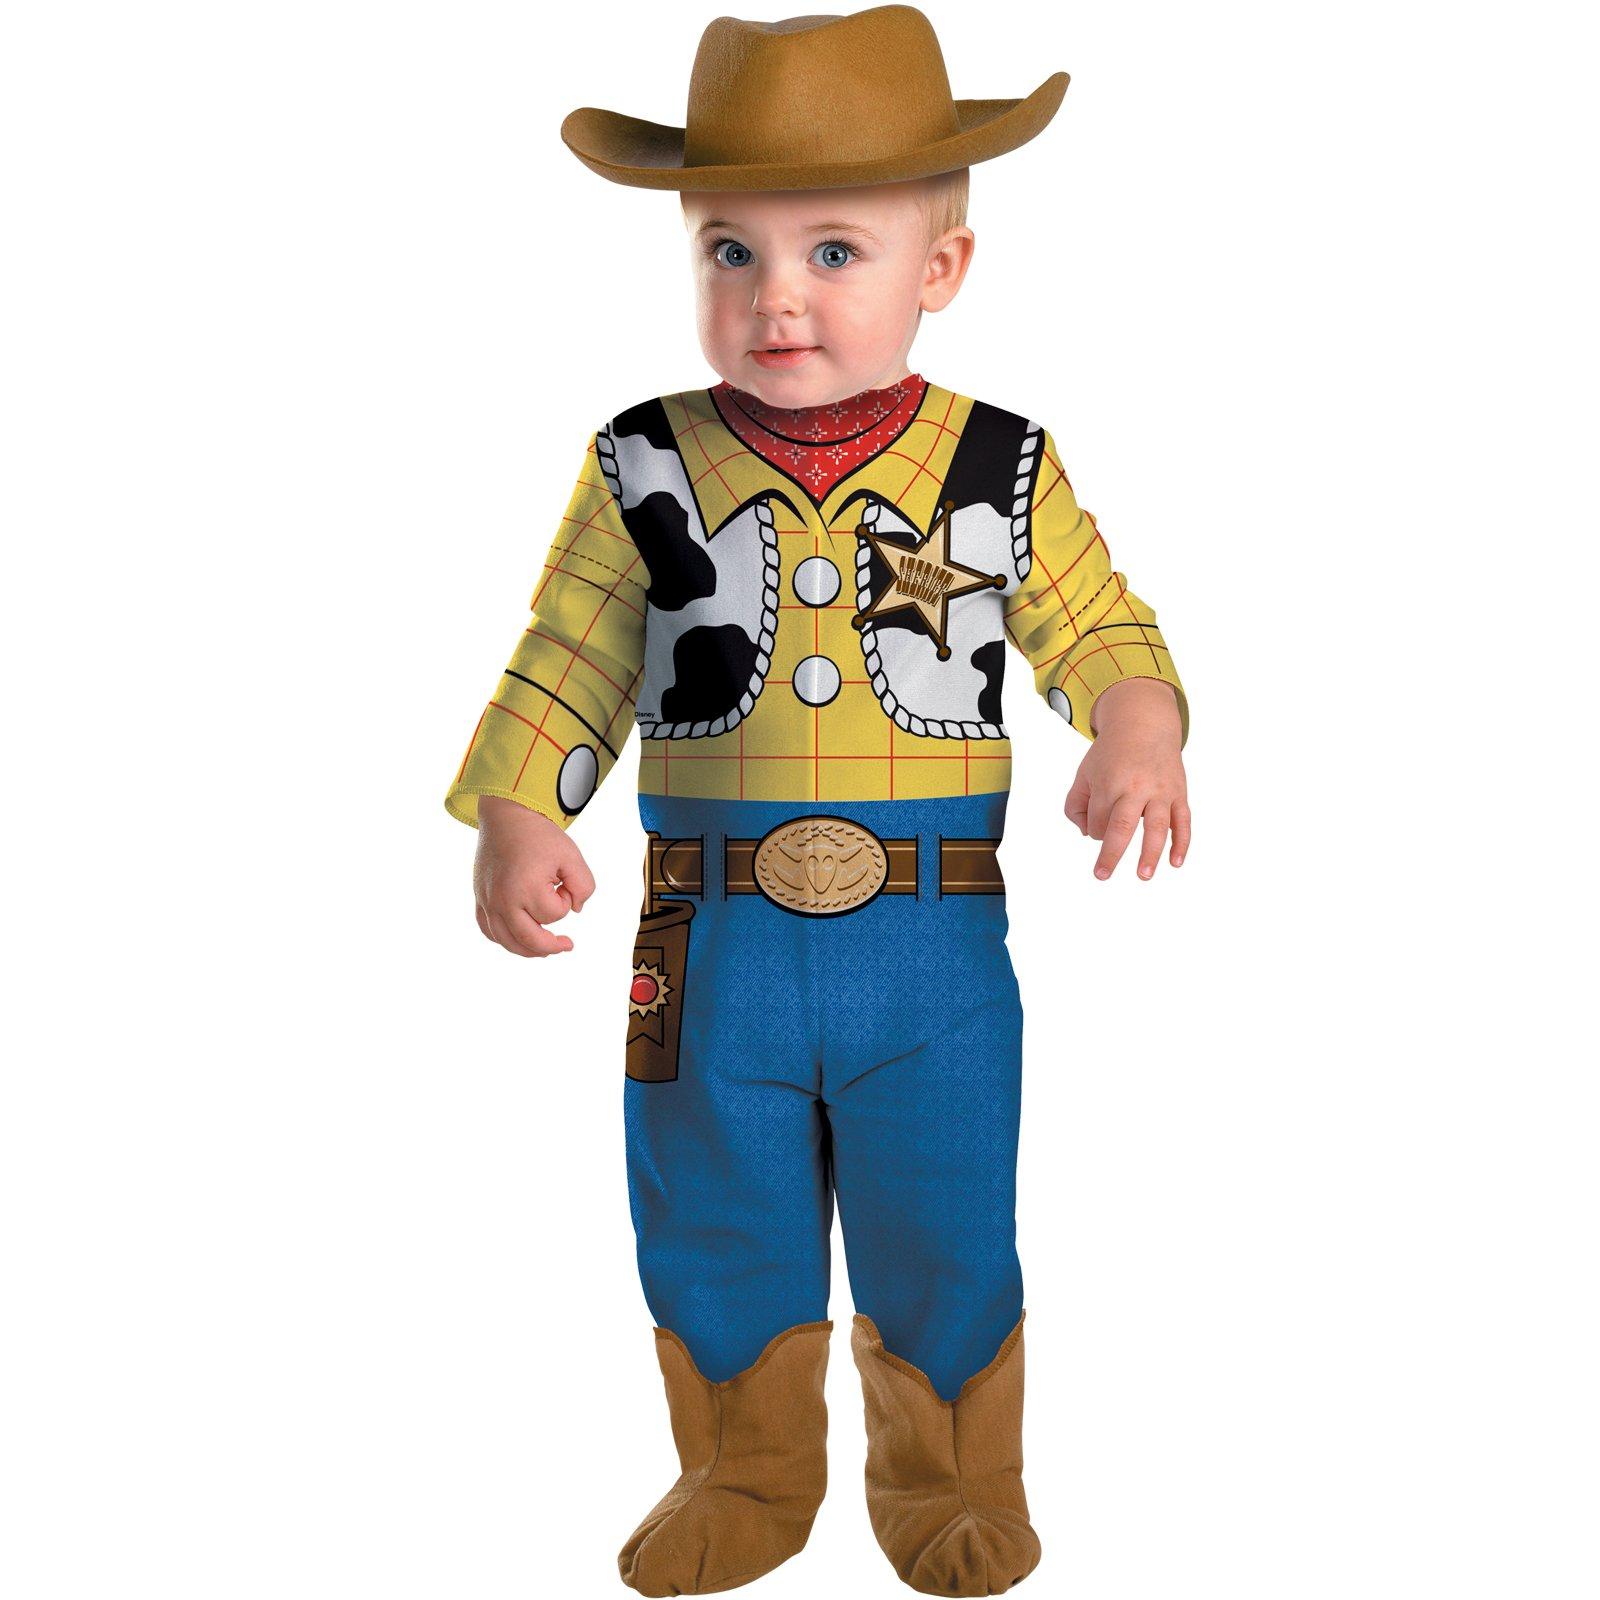 Новогодний костюм мальчику на 2 года своими